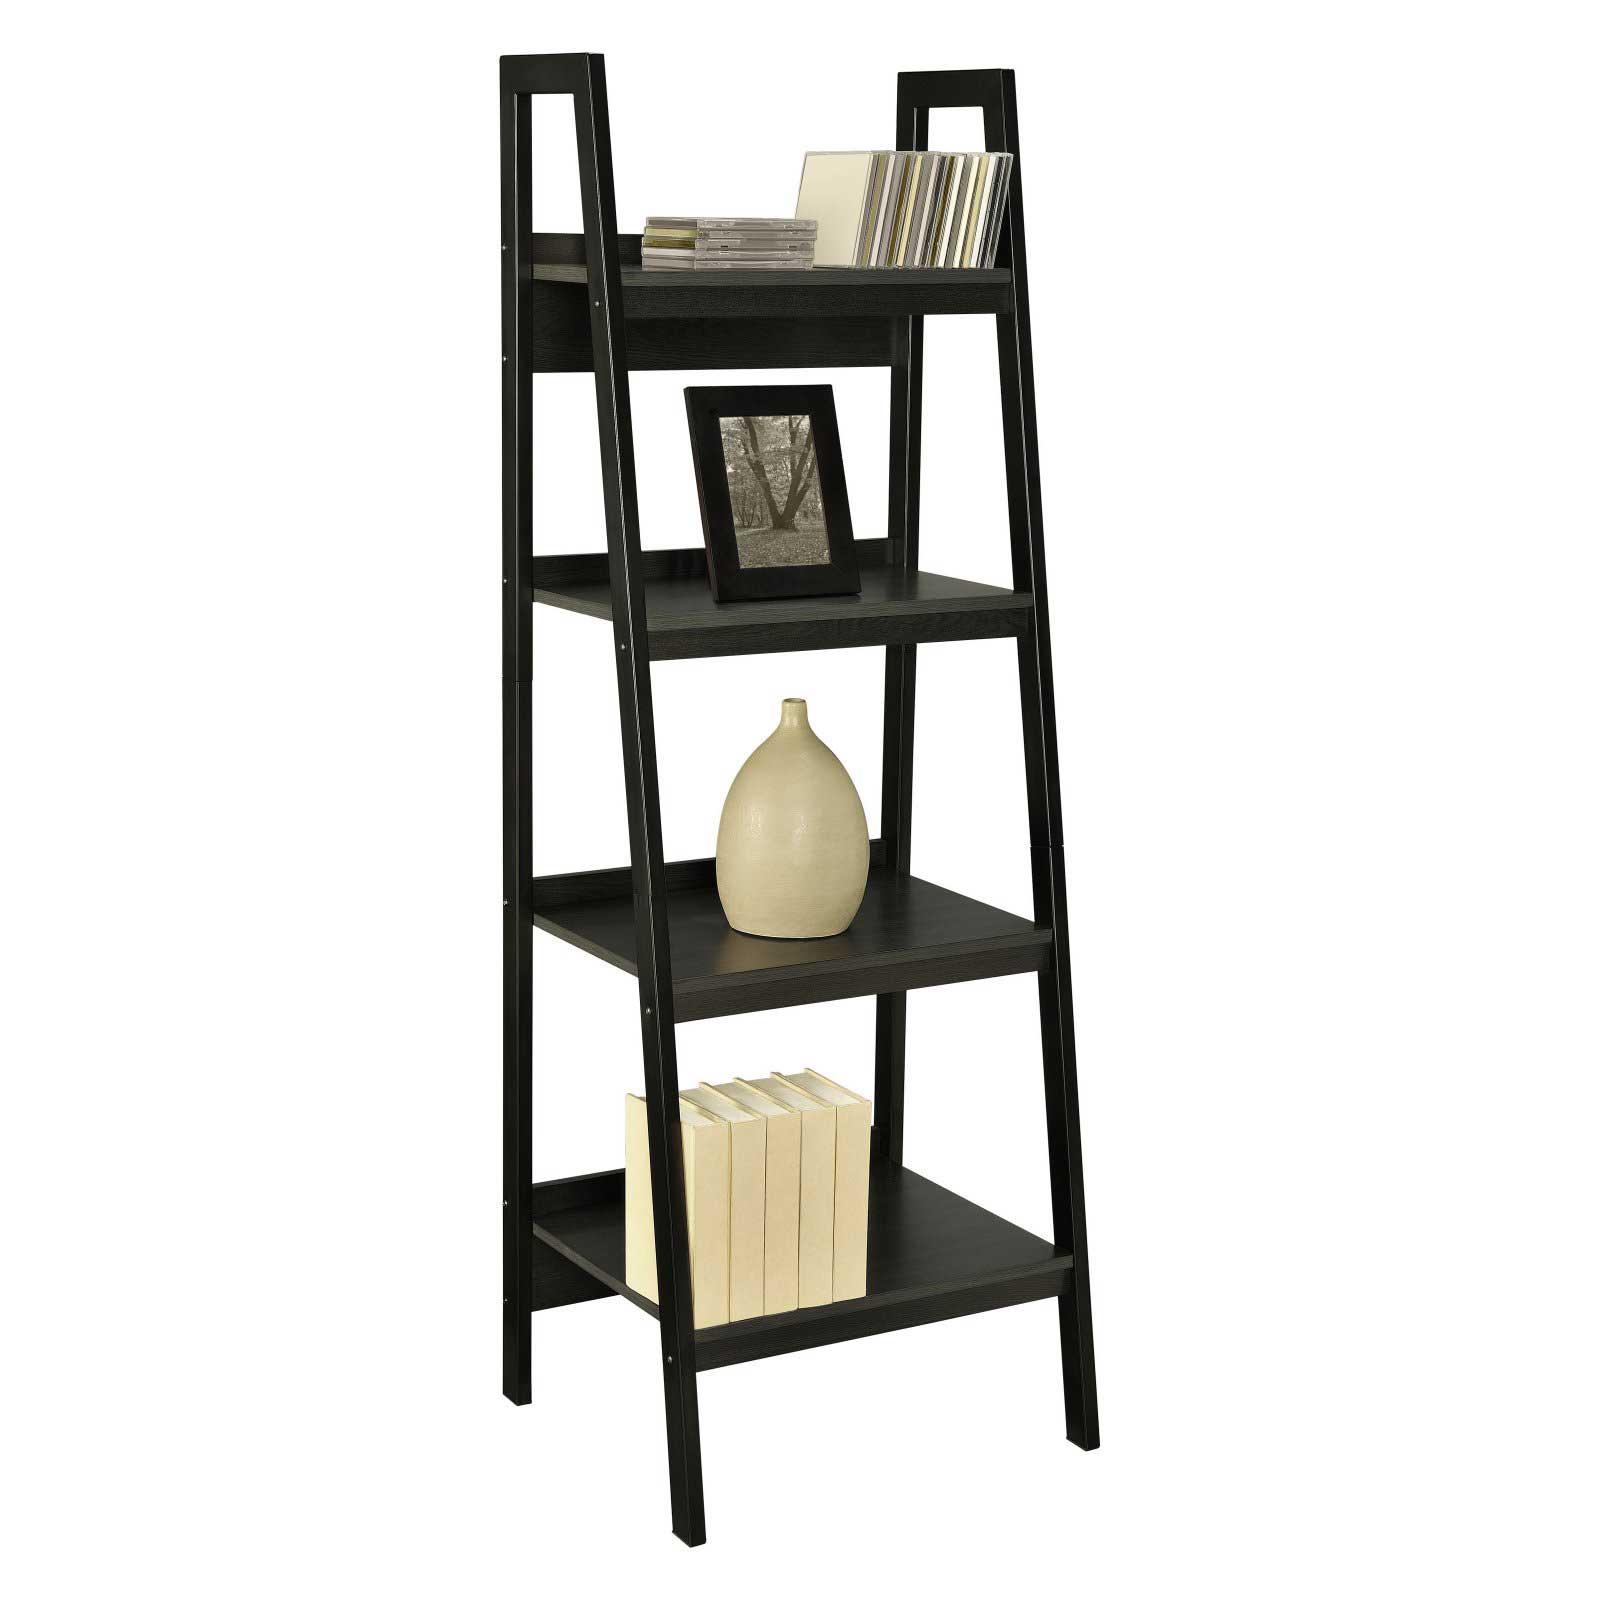 title | Ladder Bookshelf